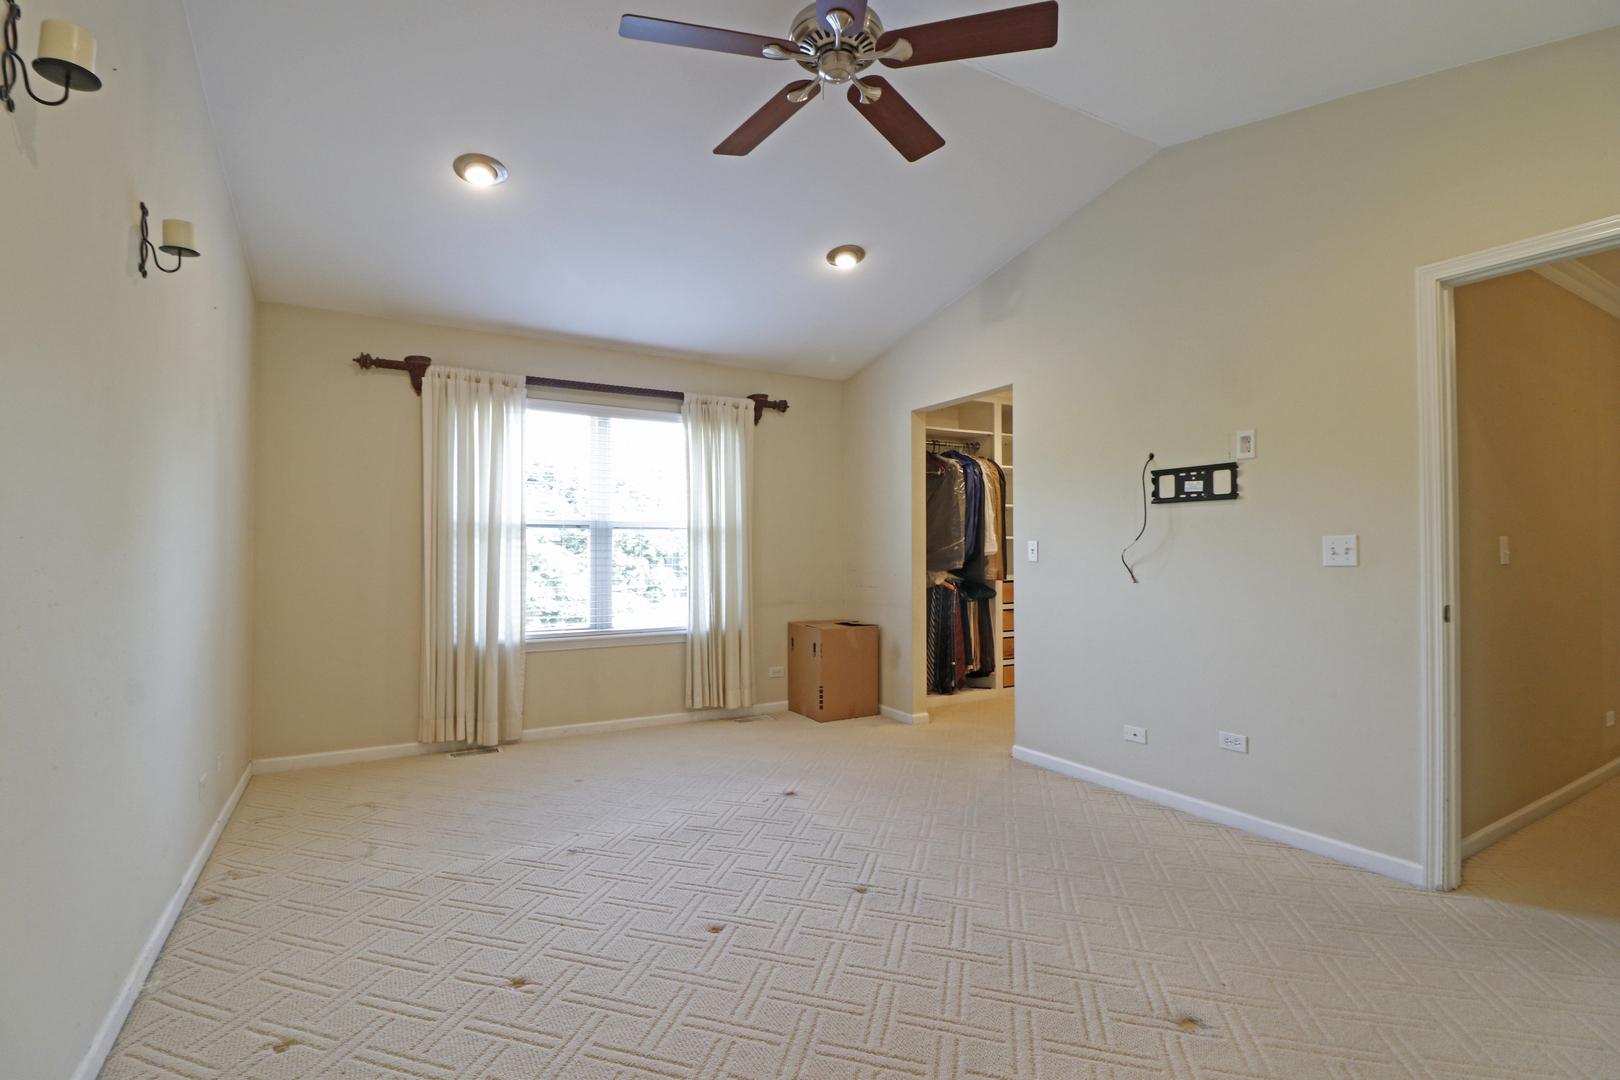 493 Buckingham, Grayslake, Illinois, 60030